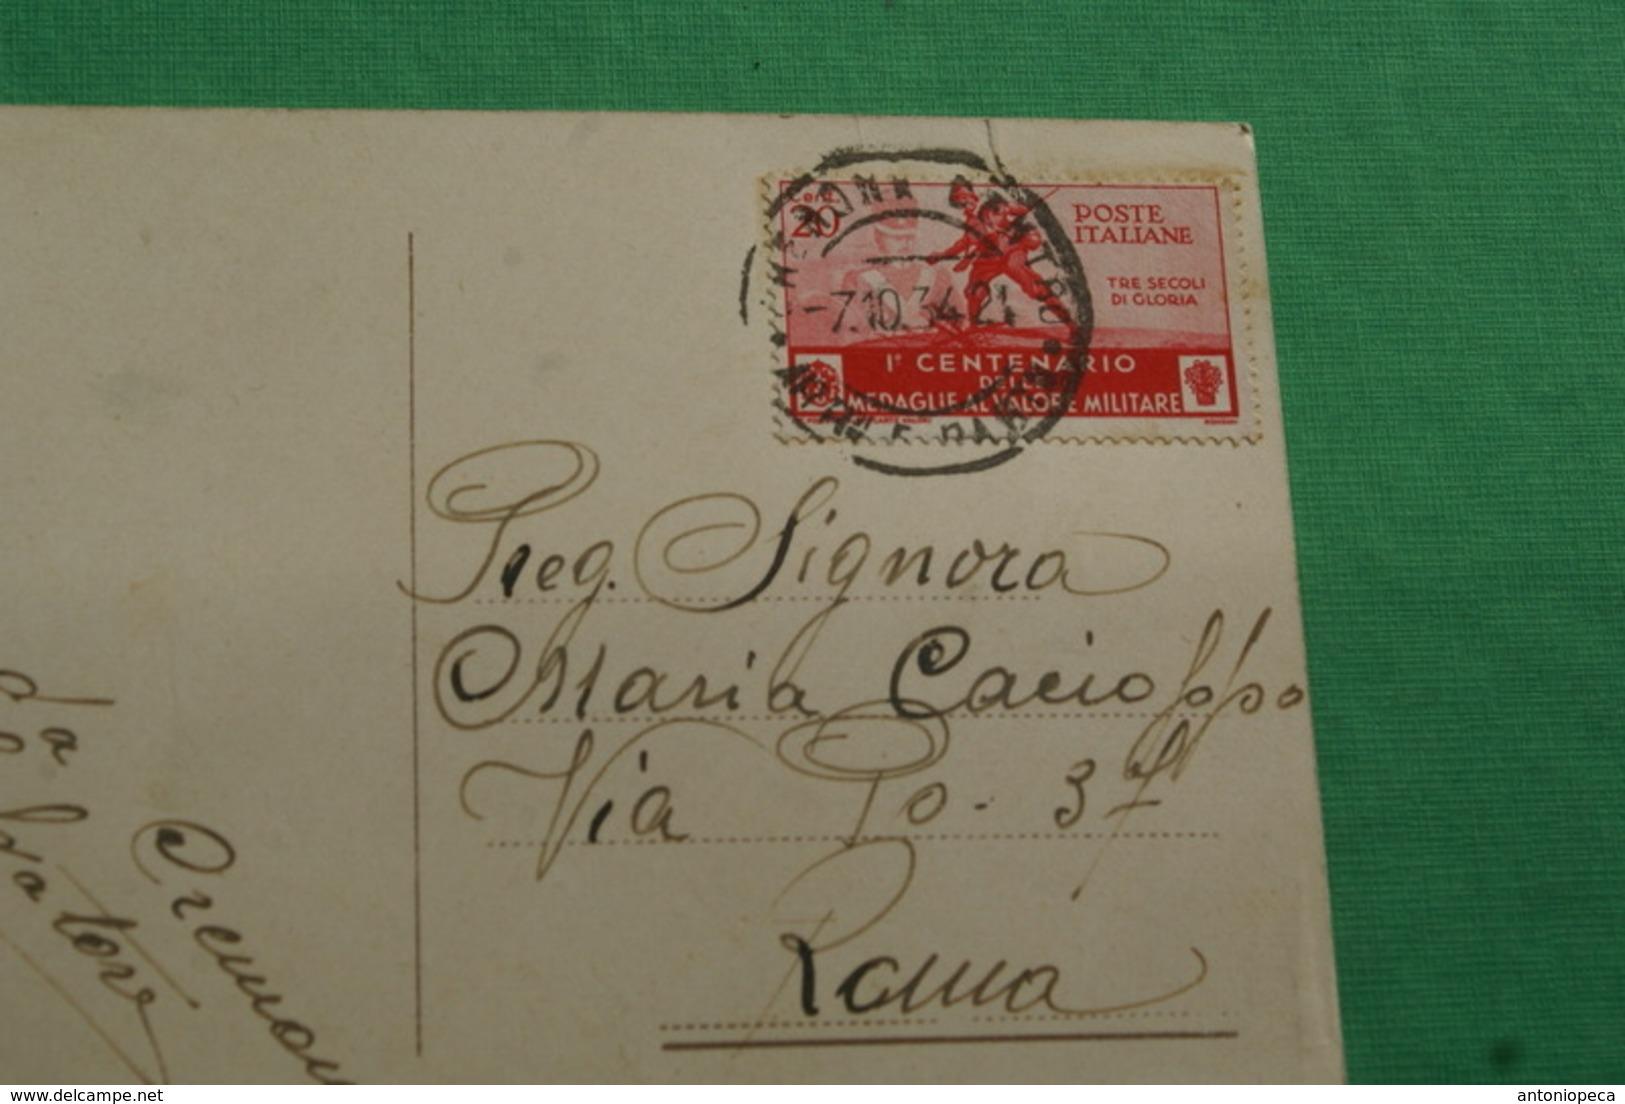 CARTOLINA CREMONA 1934, AFFRANCATA 1° CENTENARIO MEDAGLIE, VIAGGIATA - Cremona